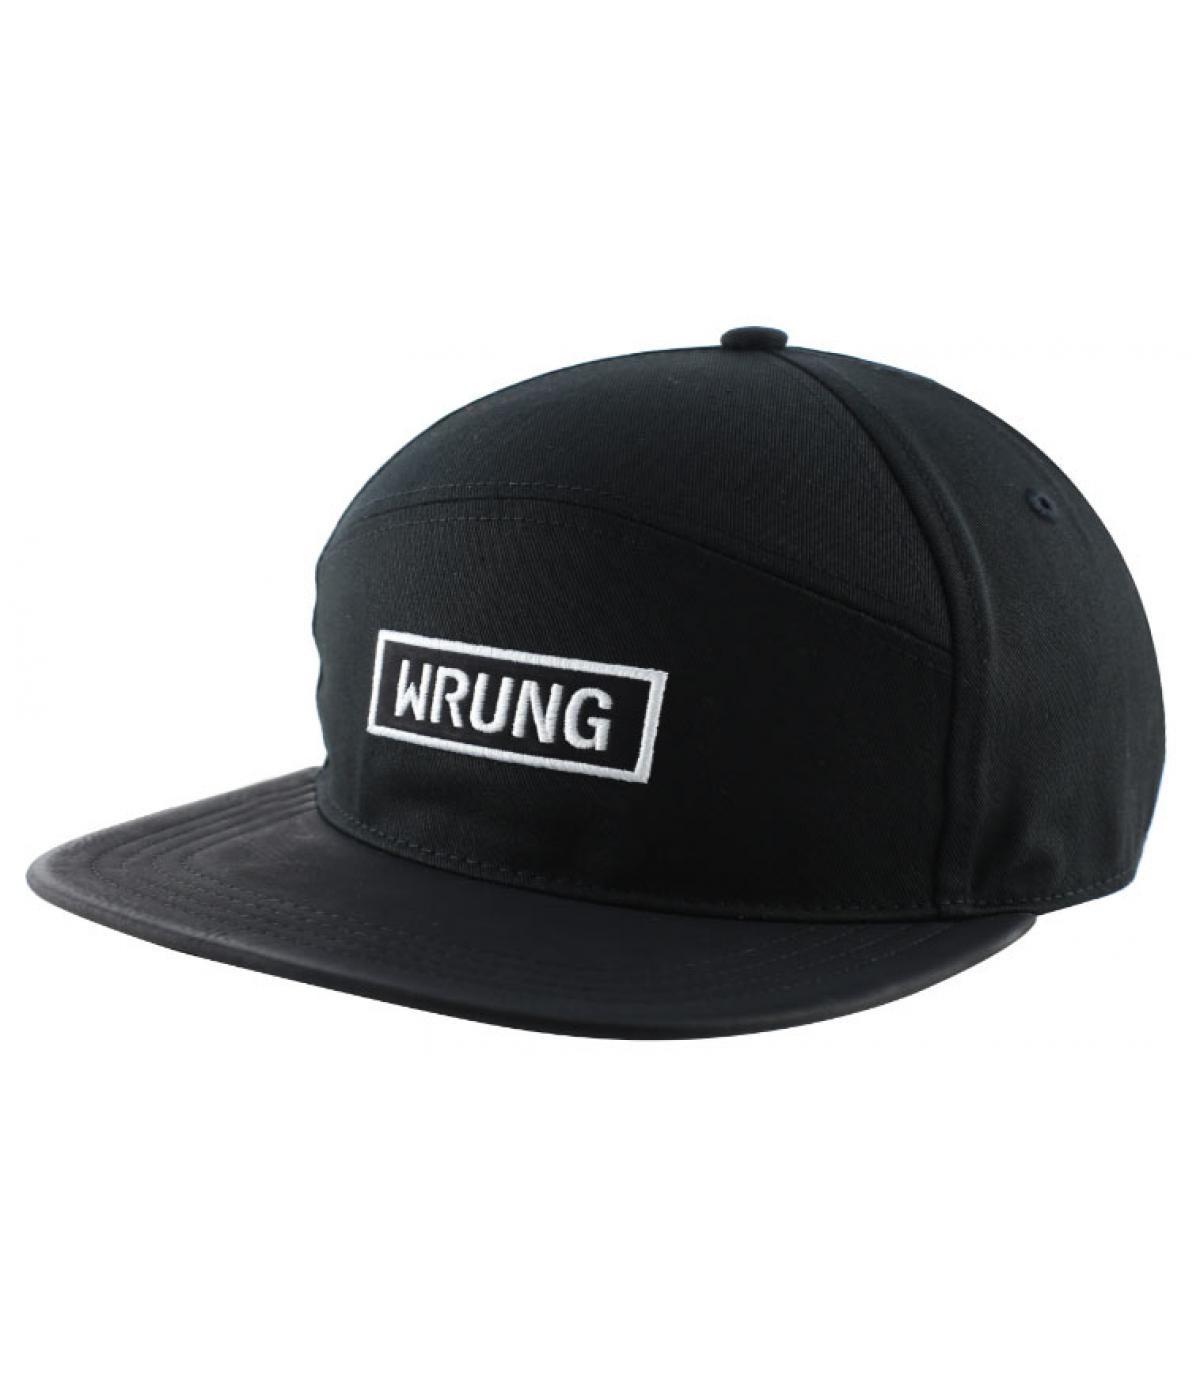 visera logo rectángulo Wrung